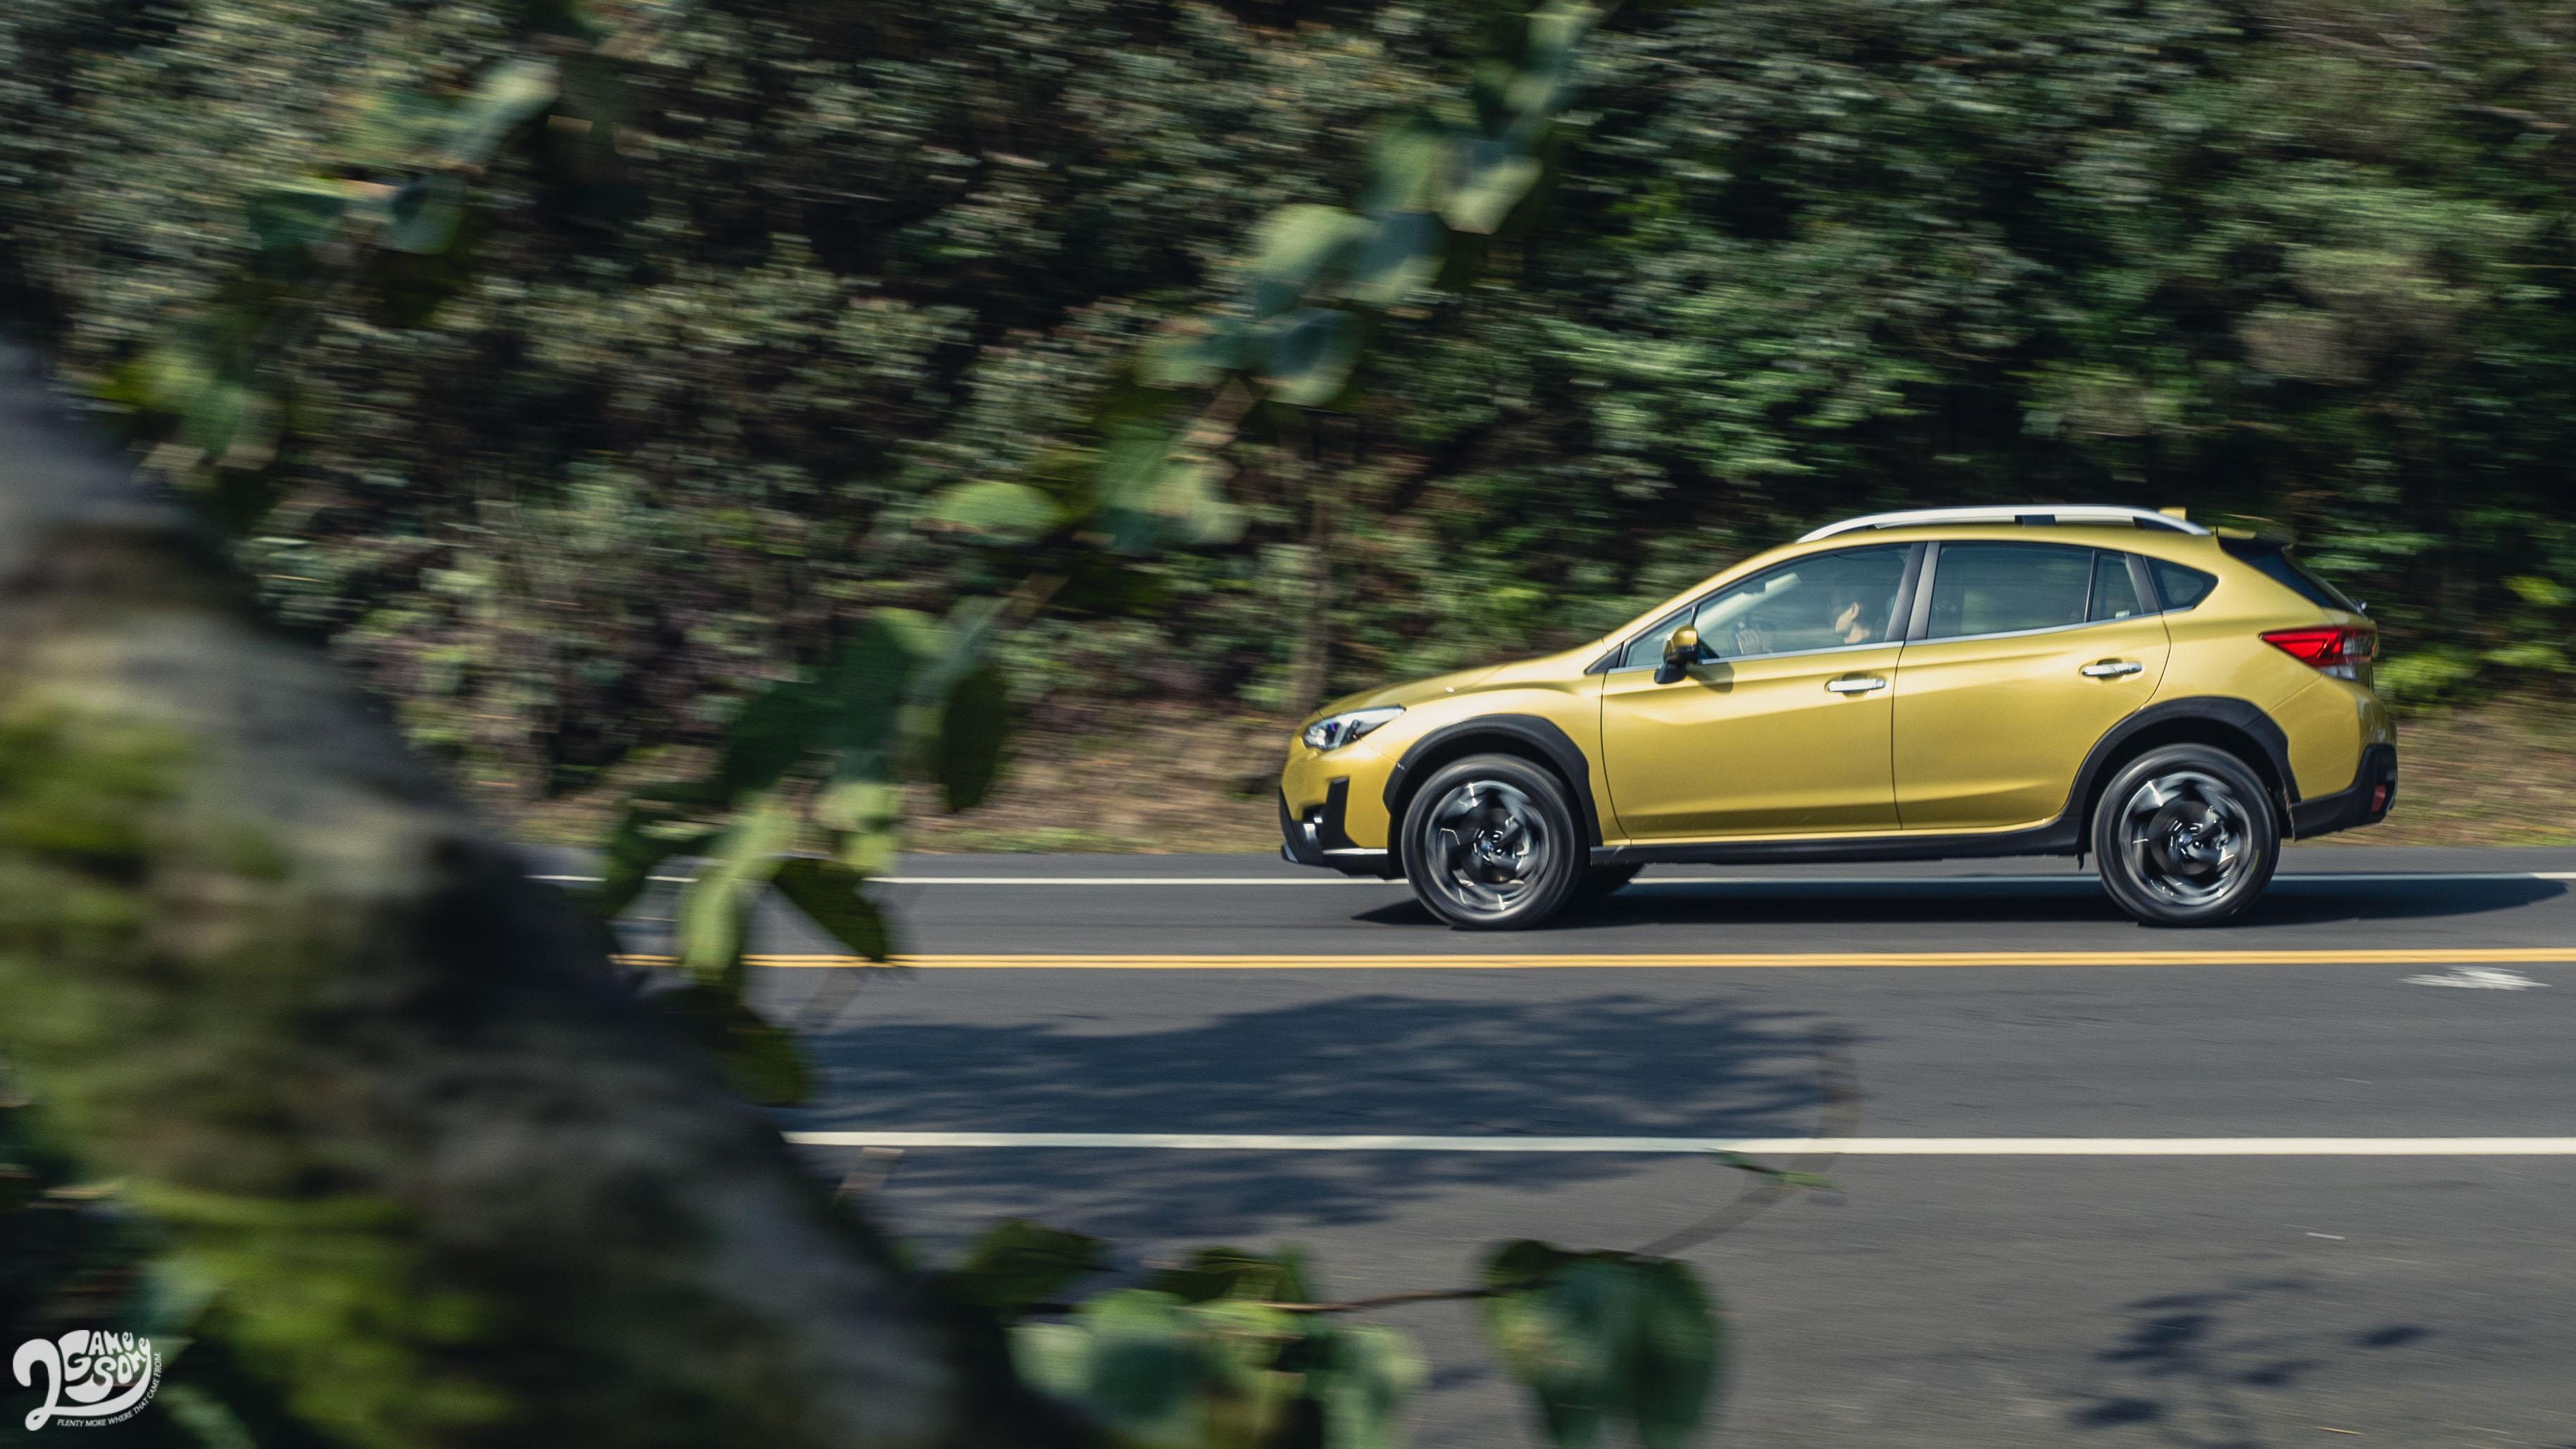 2021 Subaru XV,車界的斜槓精英